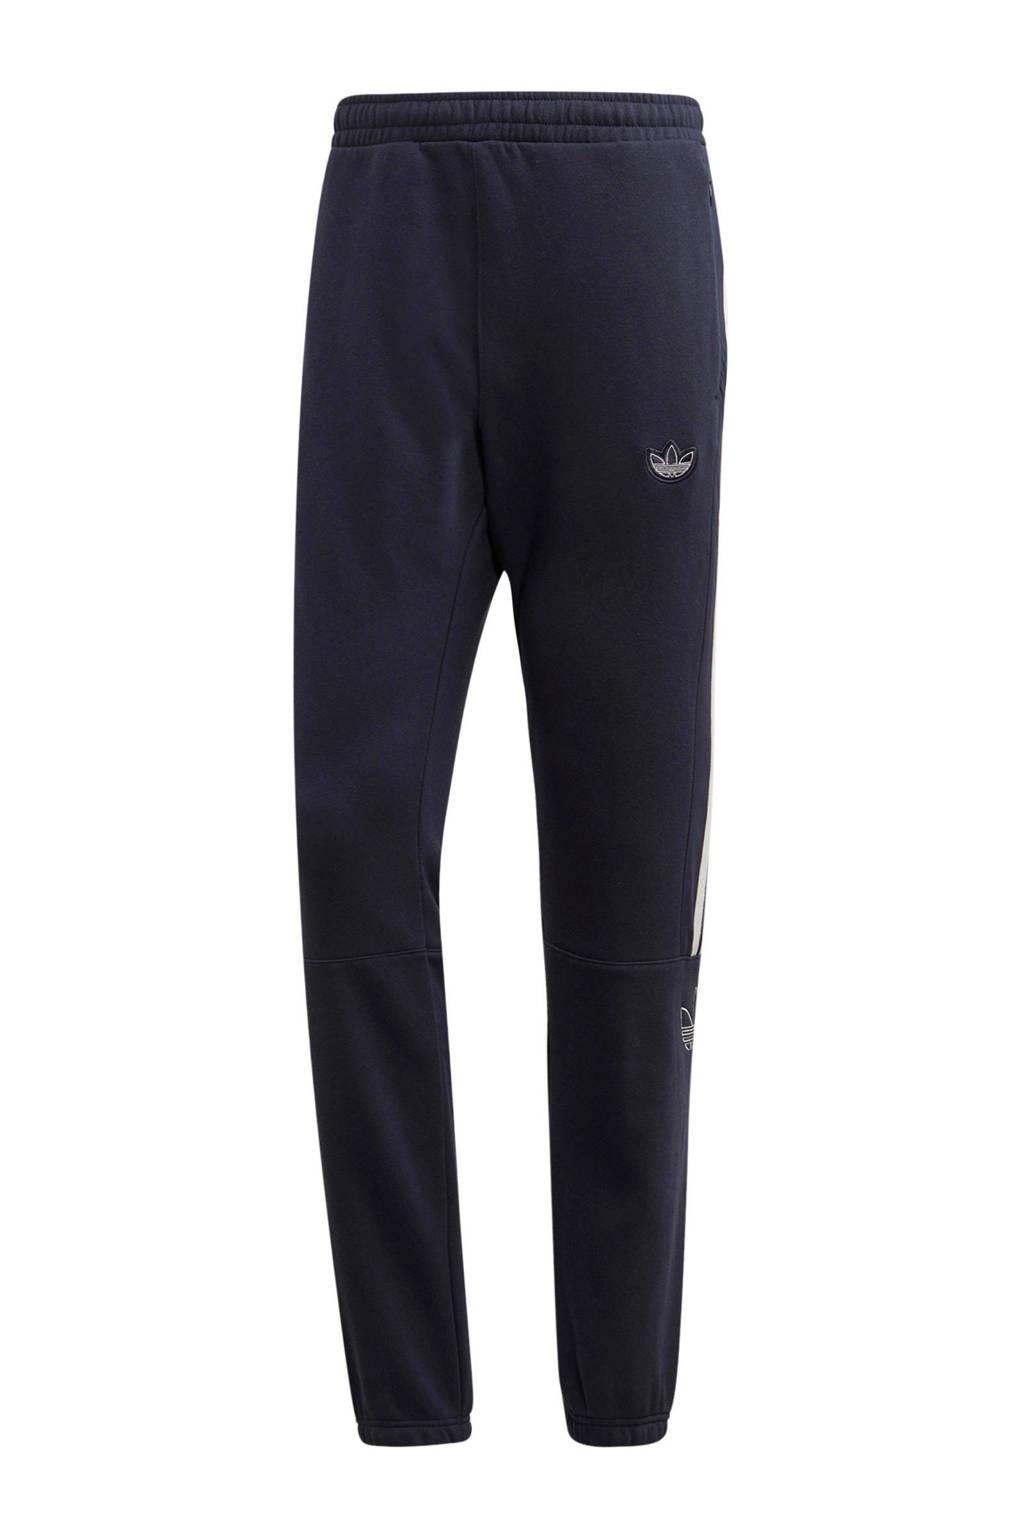 adidas Originals regular fit joggingbroek donkerblauw/wit, Donkerblauw/wit